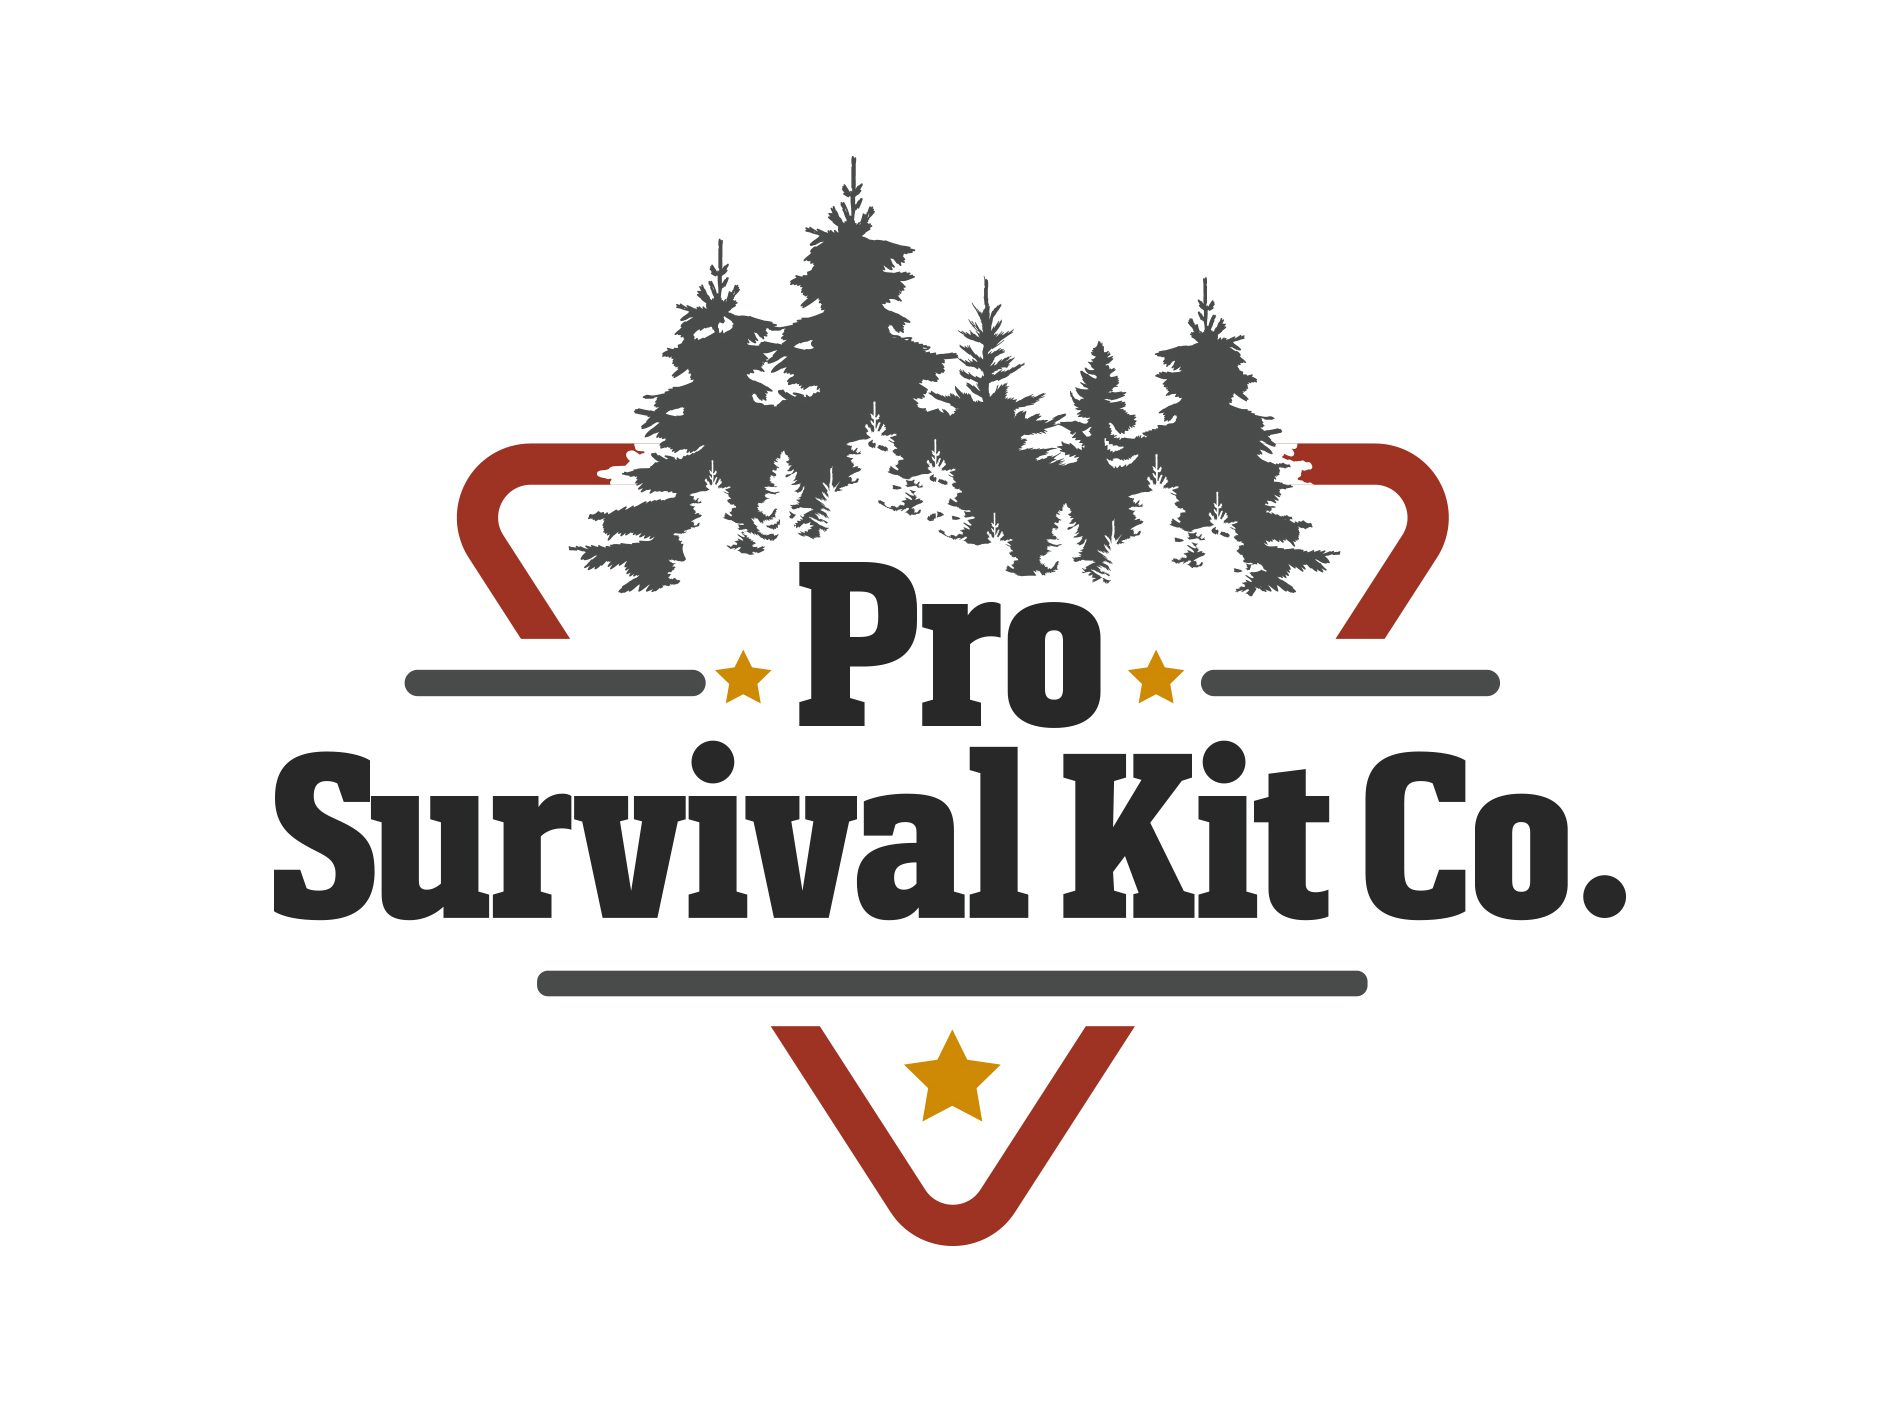 Pro Survival Kit